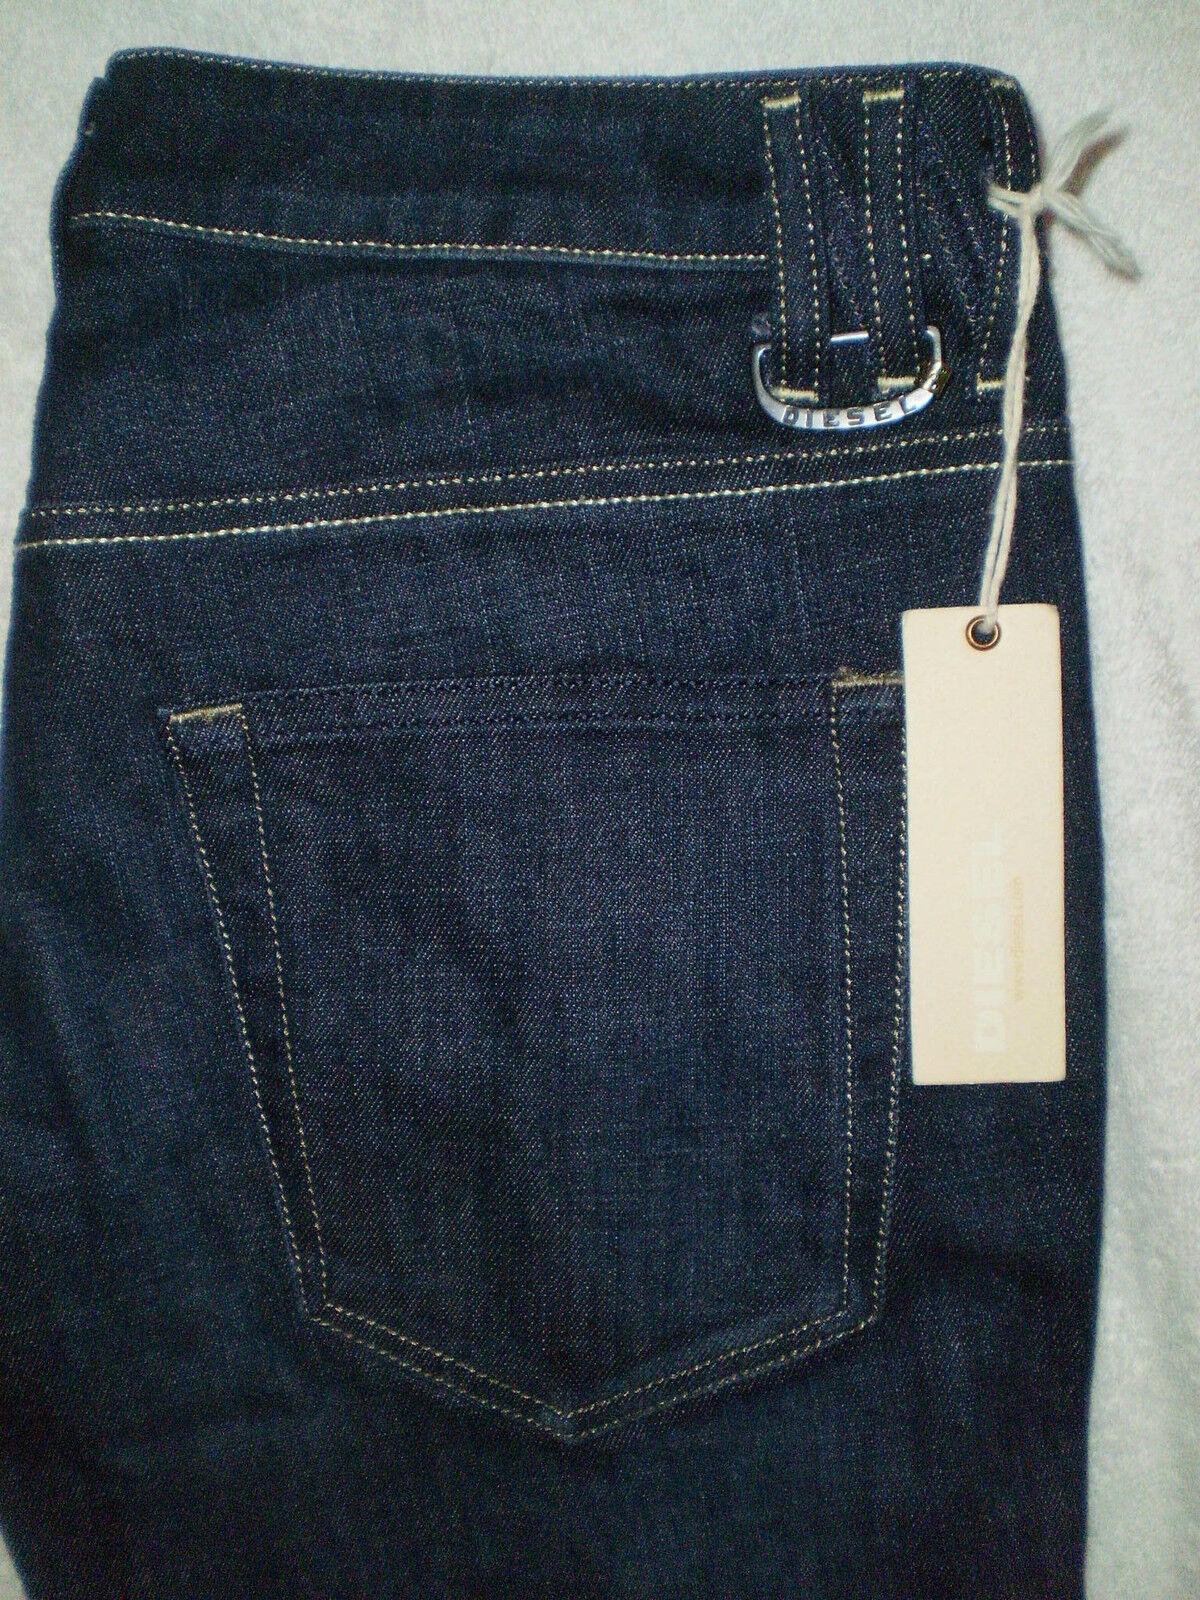 Diesel Straight Leg Womens Looppy Stretch Denim bluee Jeans Size 30 X 34 New